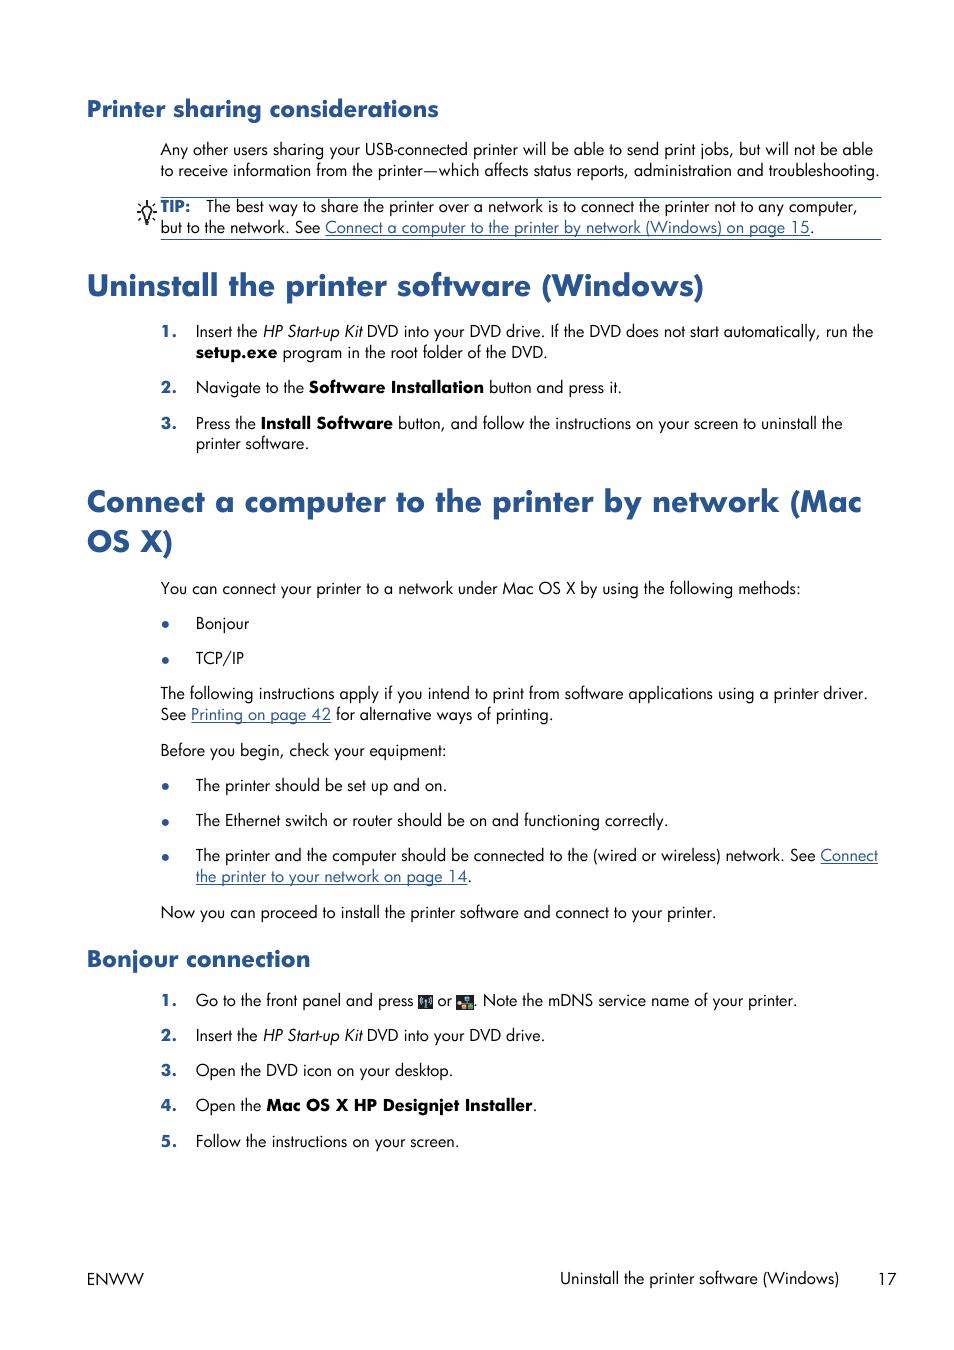 Printer sharing considerations, Uninstall the printer